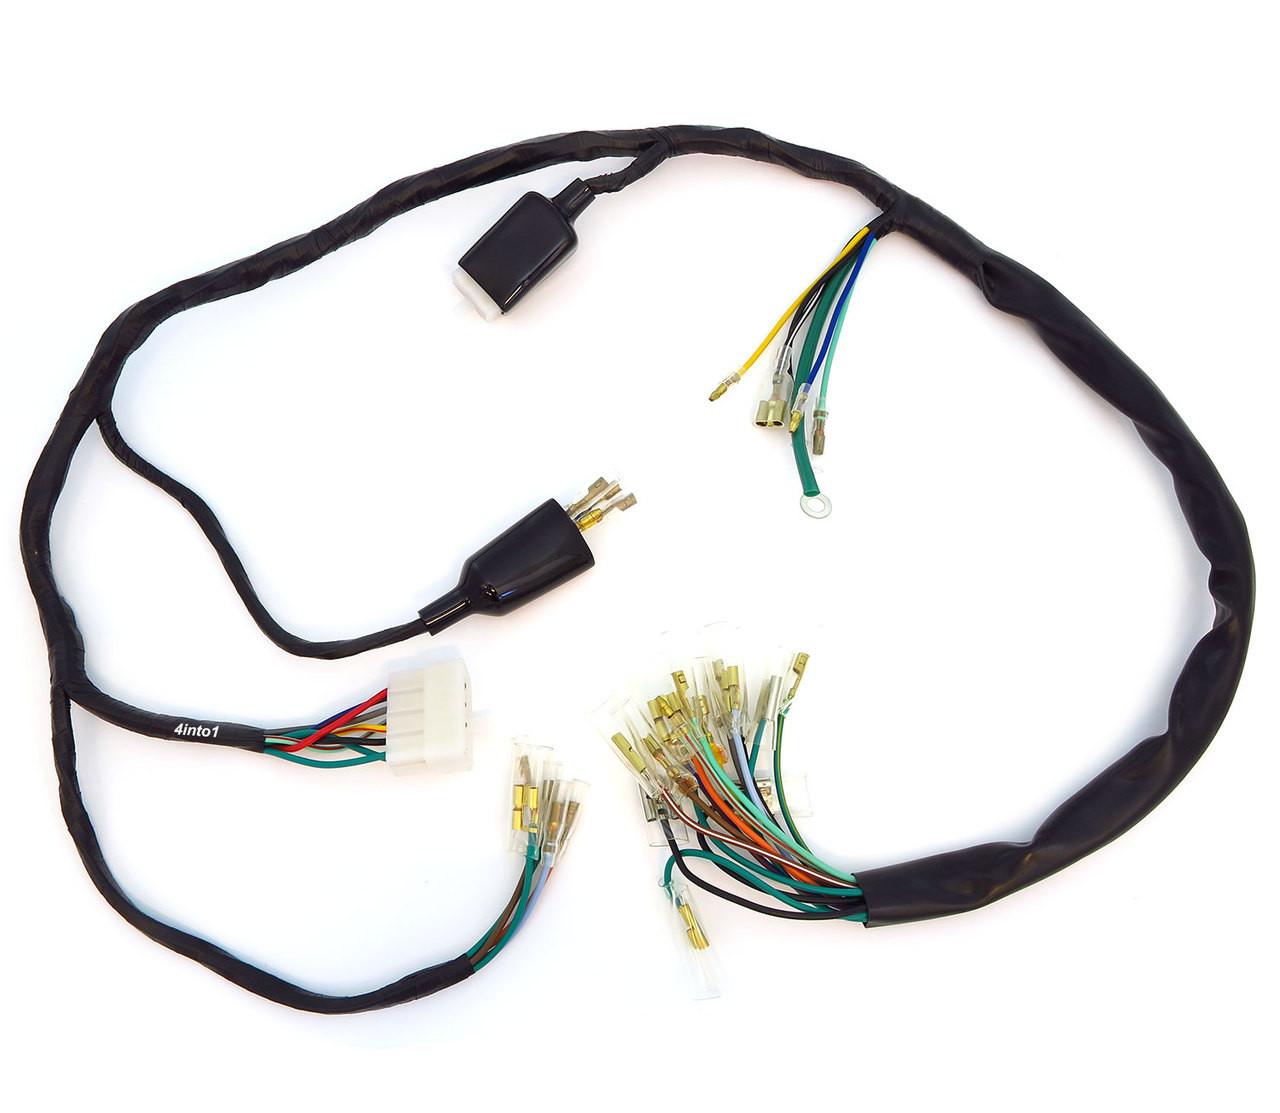 medium resolution of main wiring harness 32100 323 040 honda cb500k 1972 1973main wiring harness 10